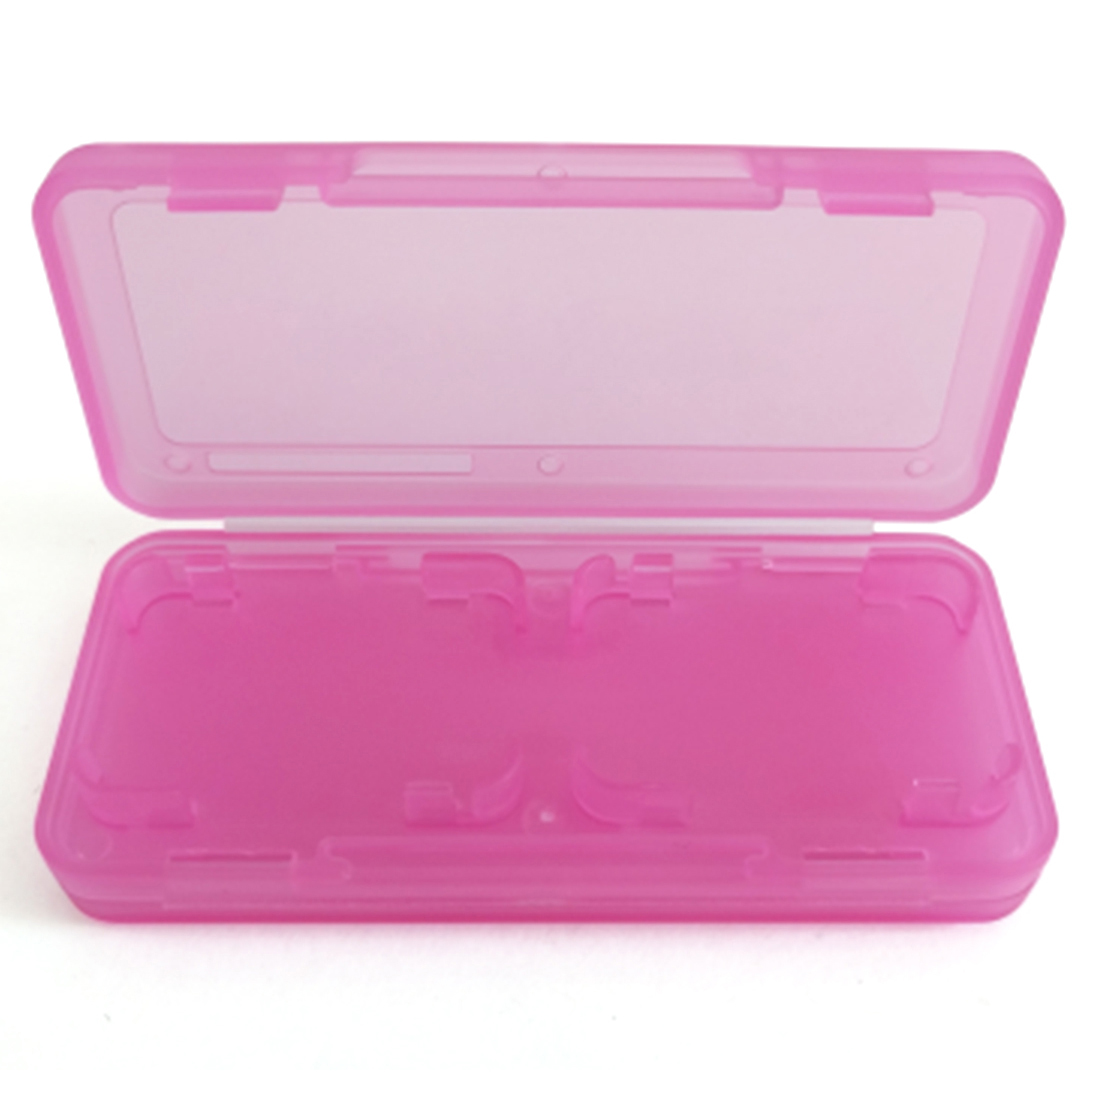 Indigo7 Authorized Nintendo Switch Game Card Hard Plastic Storage Protector Case Holds 4 - Pink